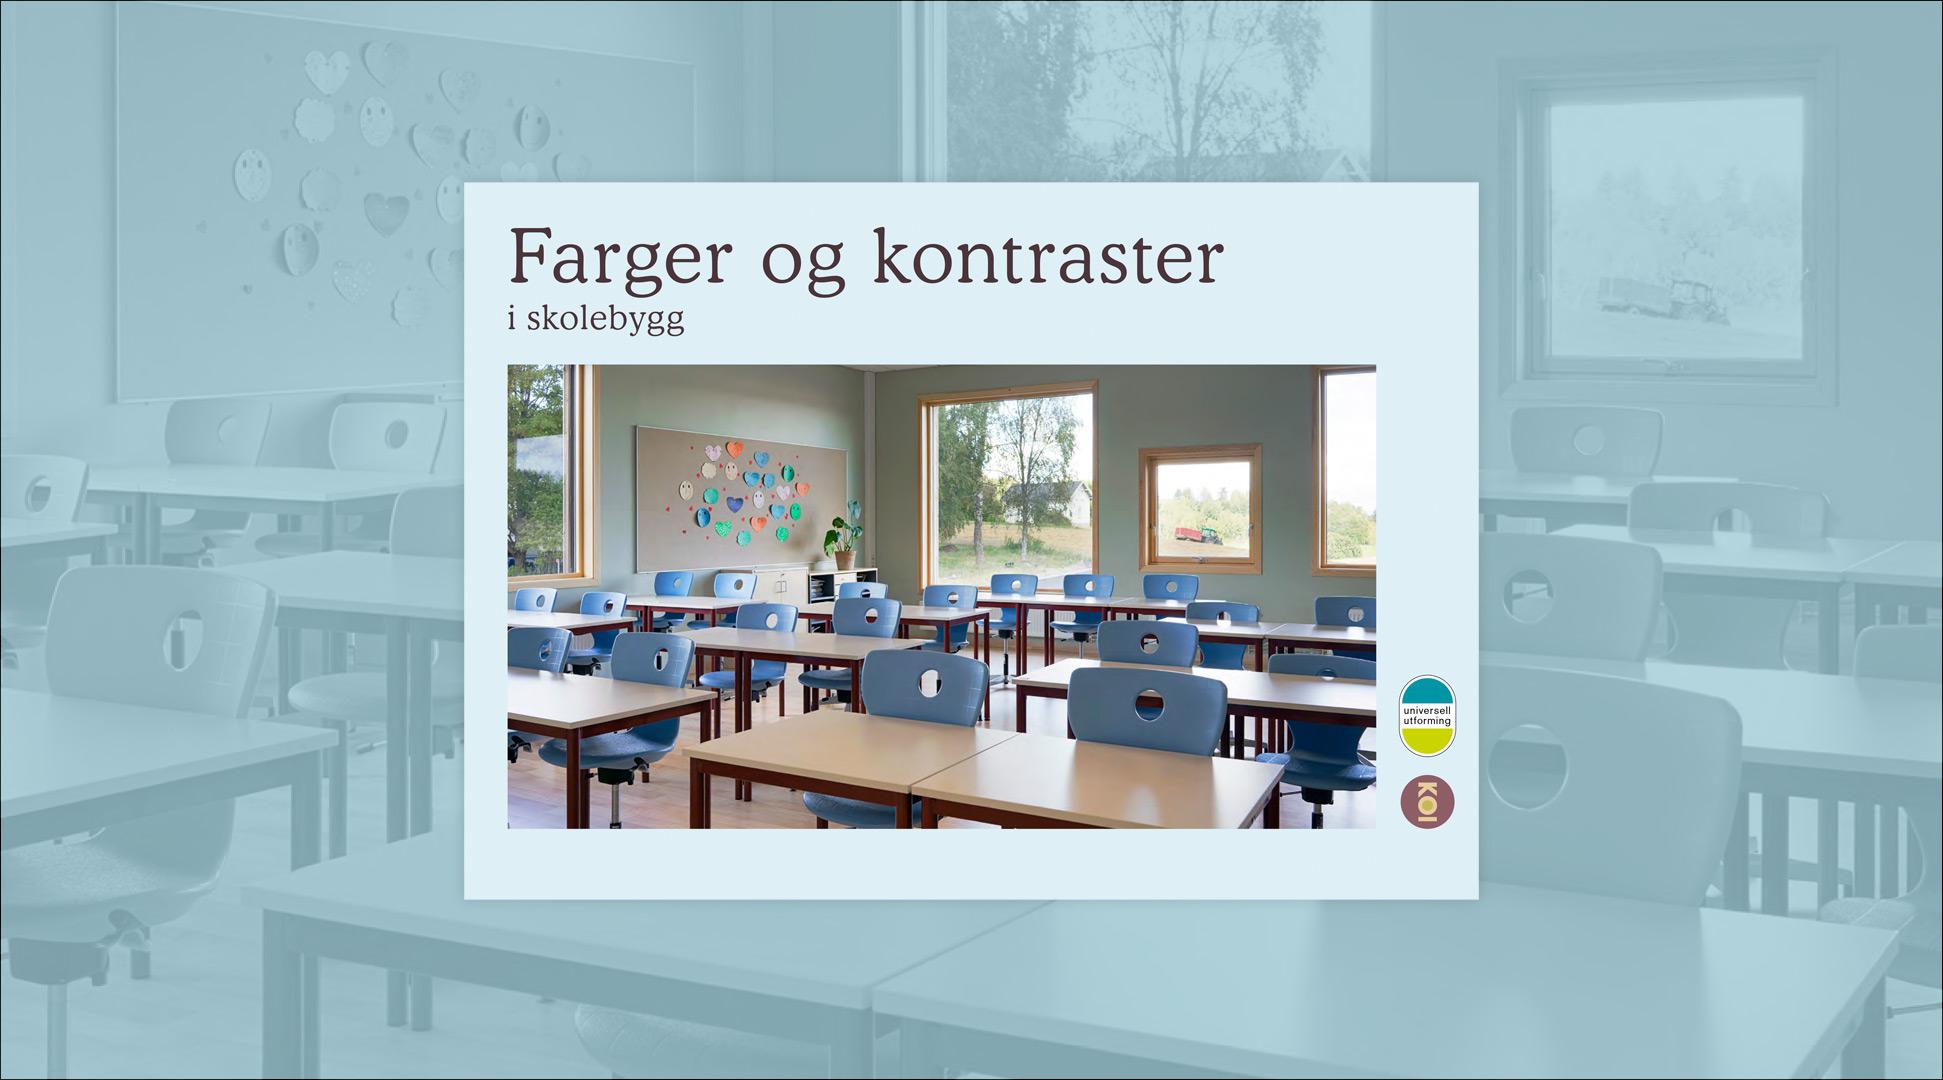 Forside fra den digitale håndbog om farver og kontrast i skolebyggeri